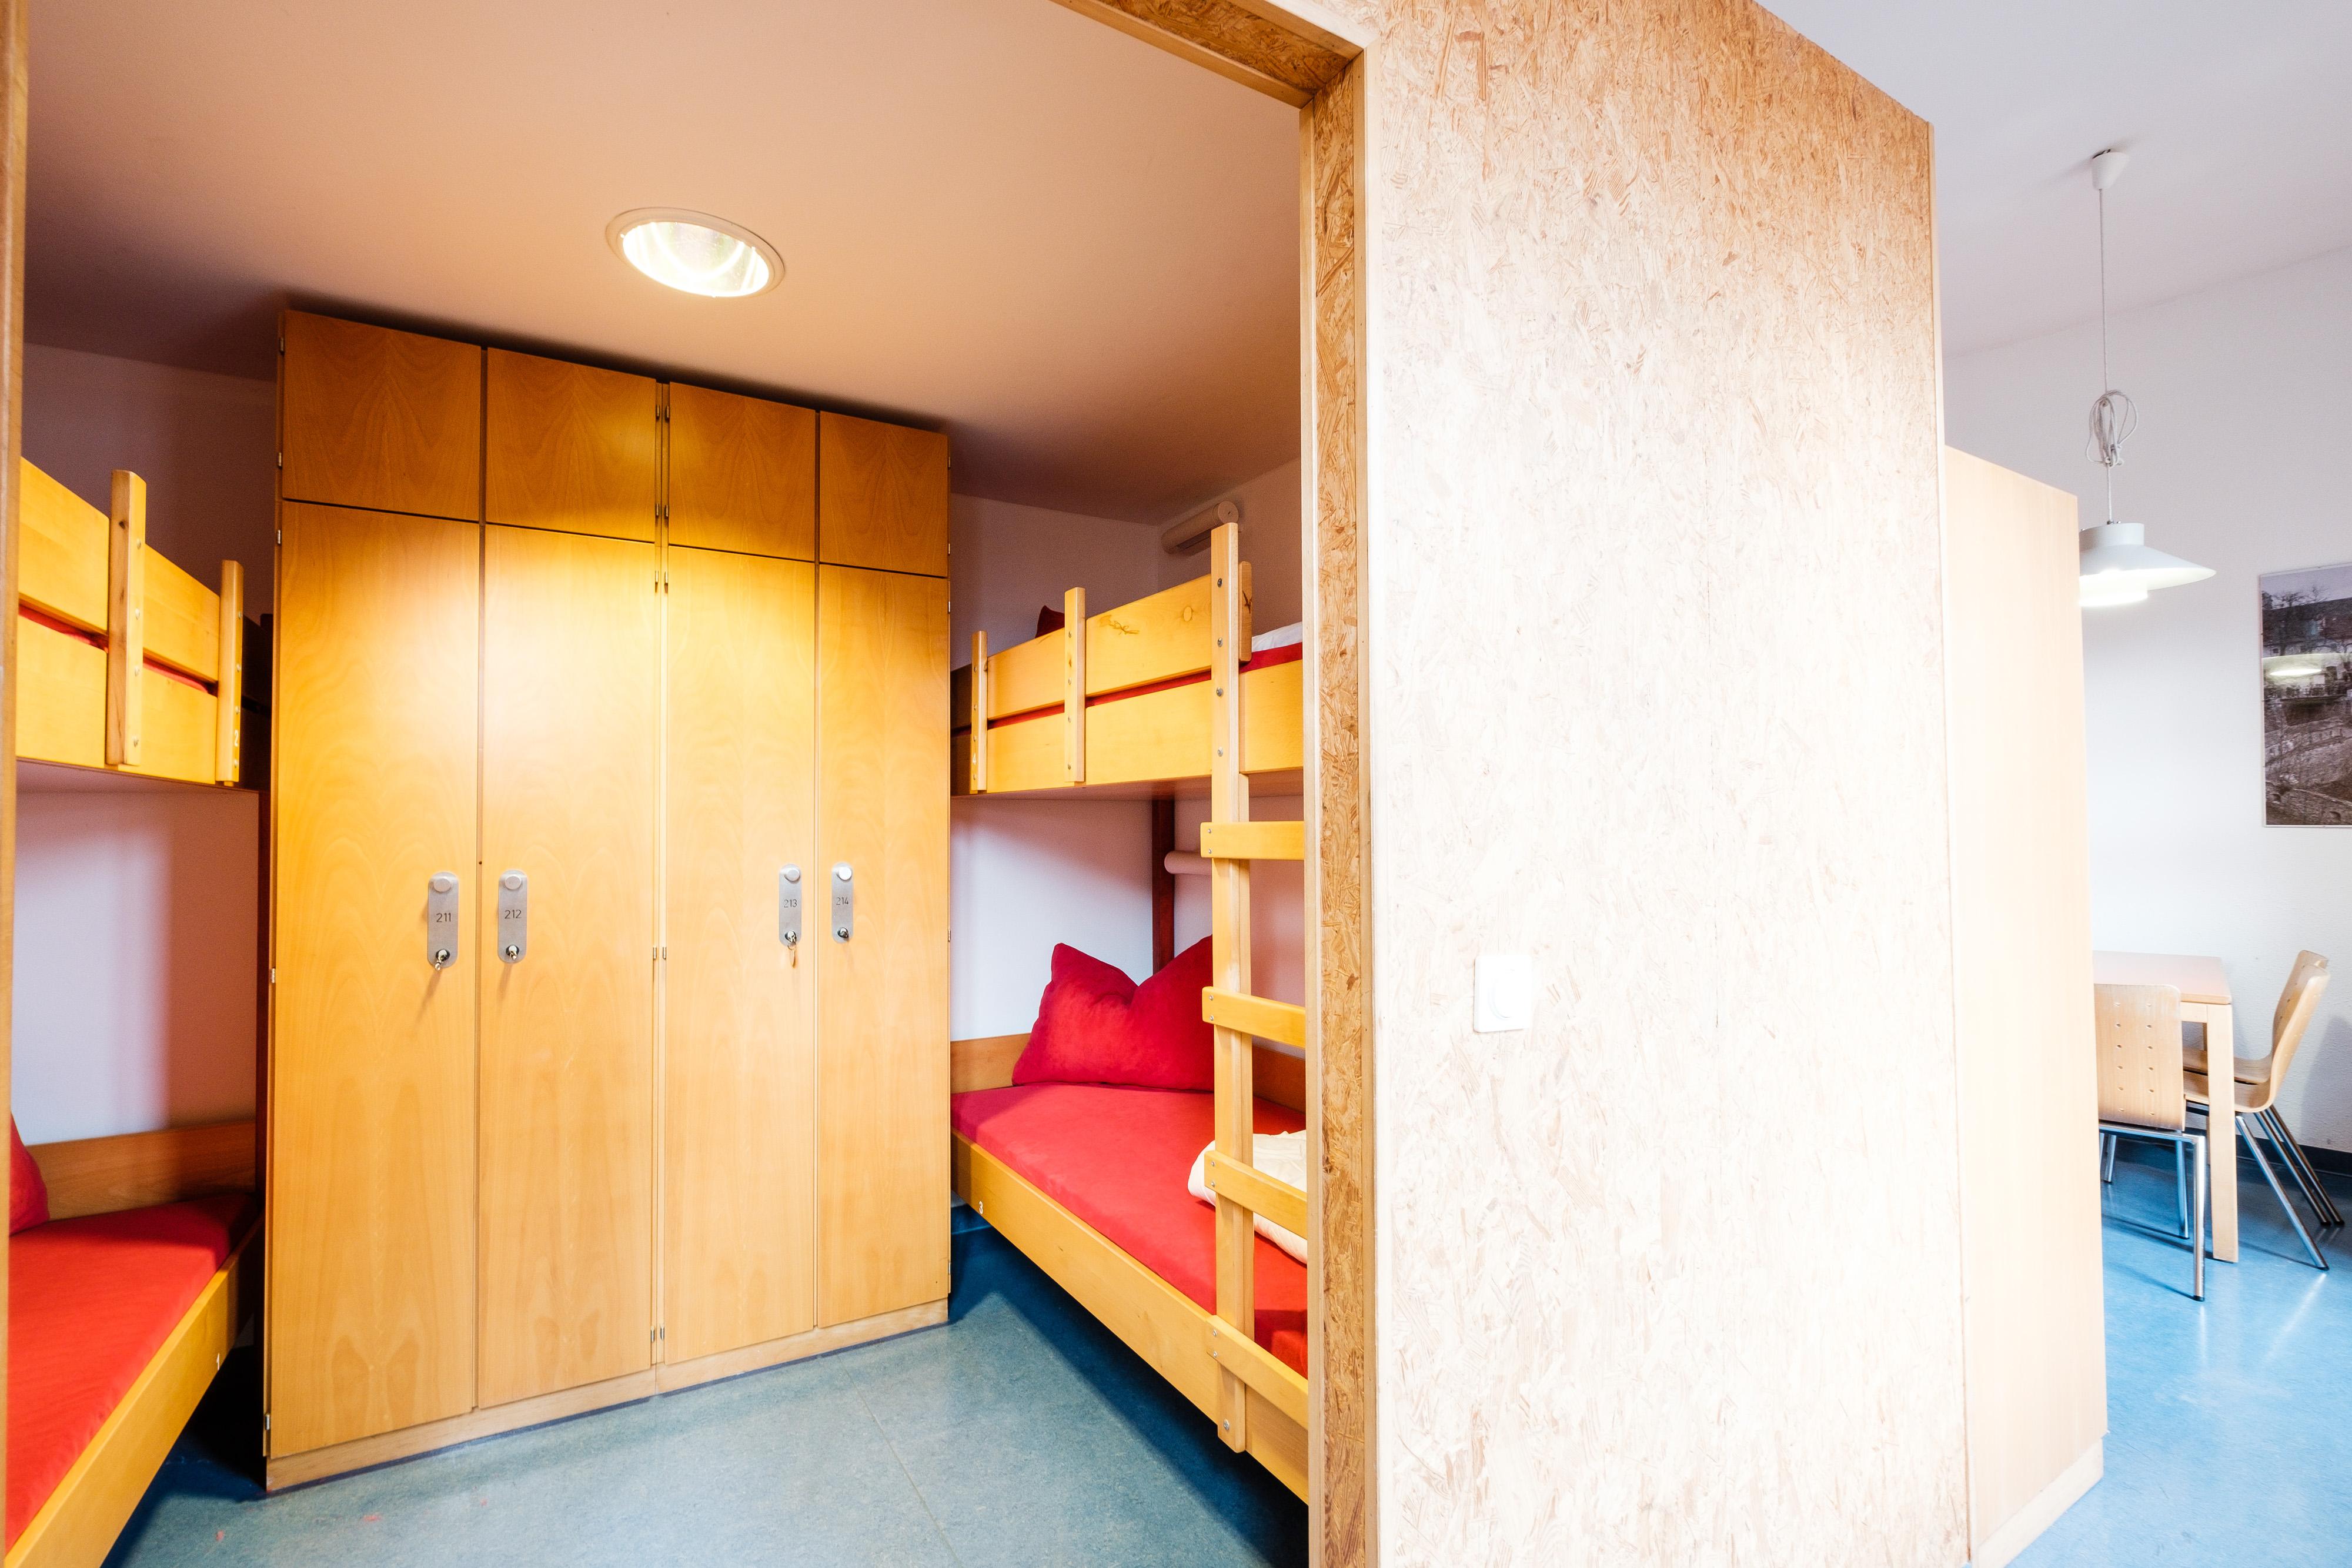 HI Hostel Jugendherberge Passau